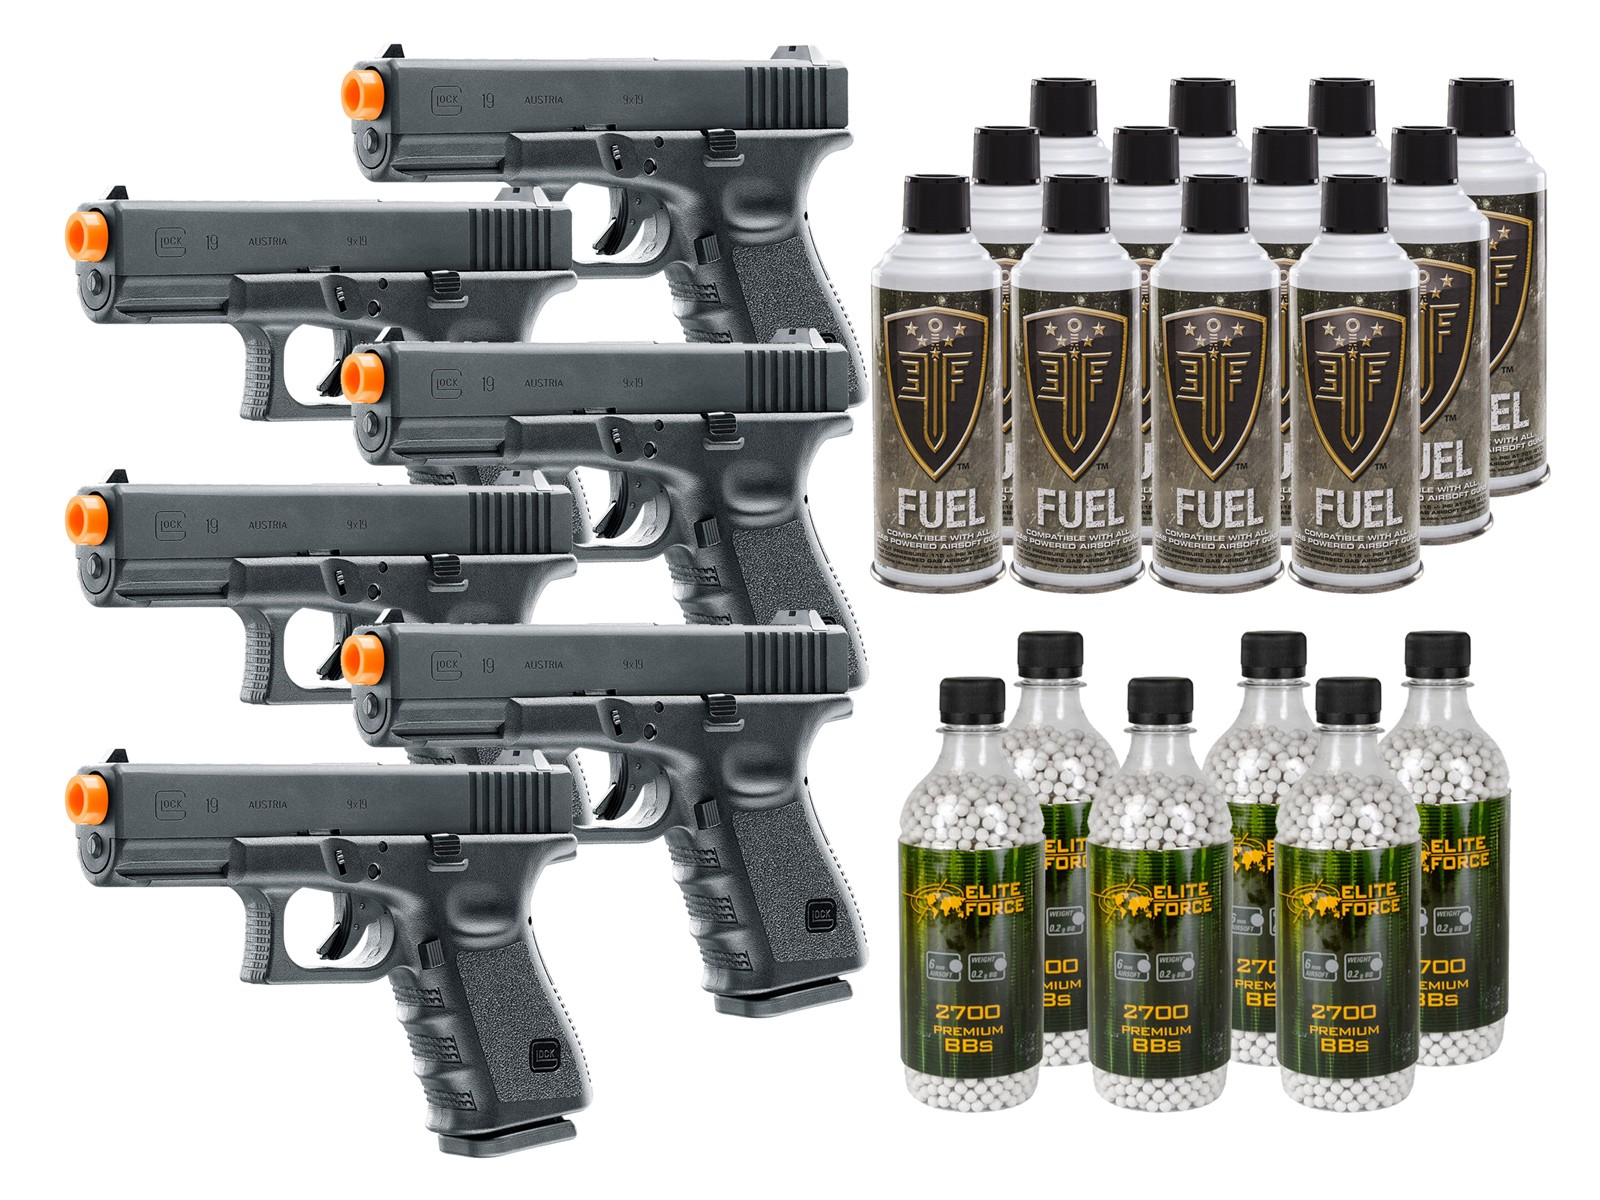 Umarex Glock 19 Gbb Airsoft Pistol Kit Incl 6 Pistols Airsoft Guns